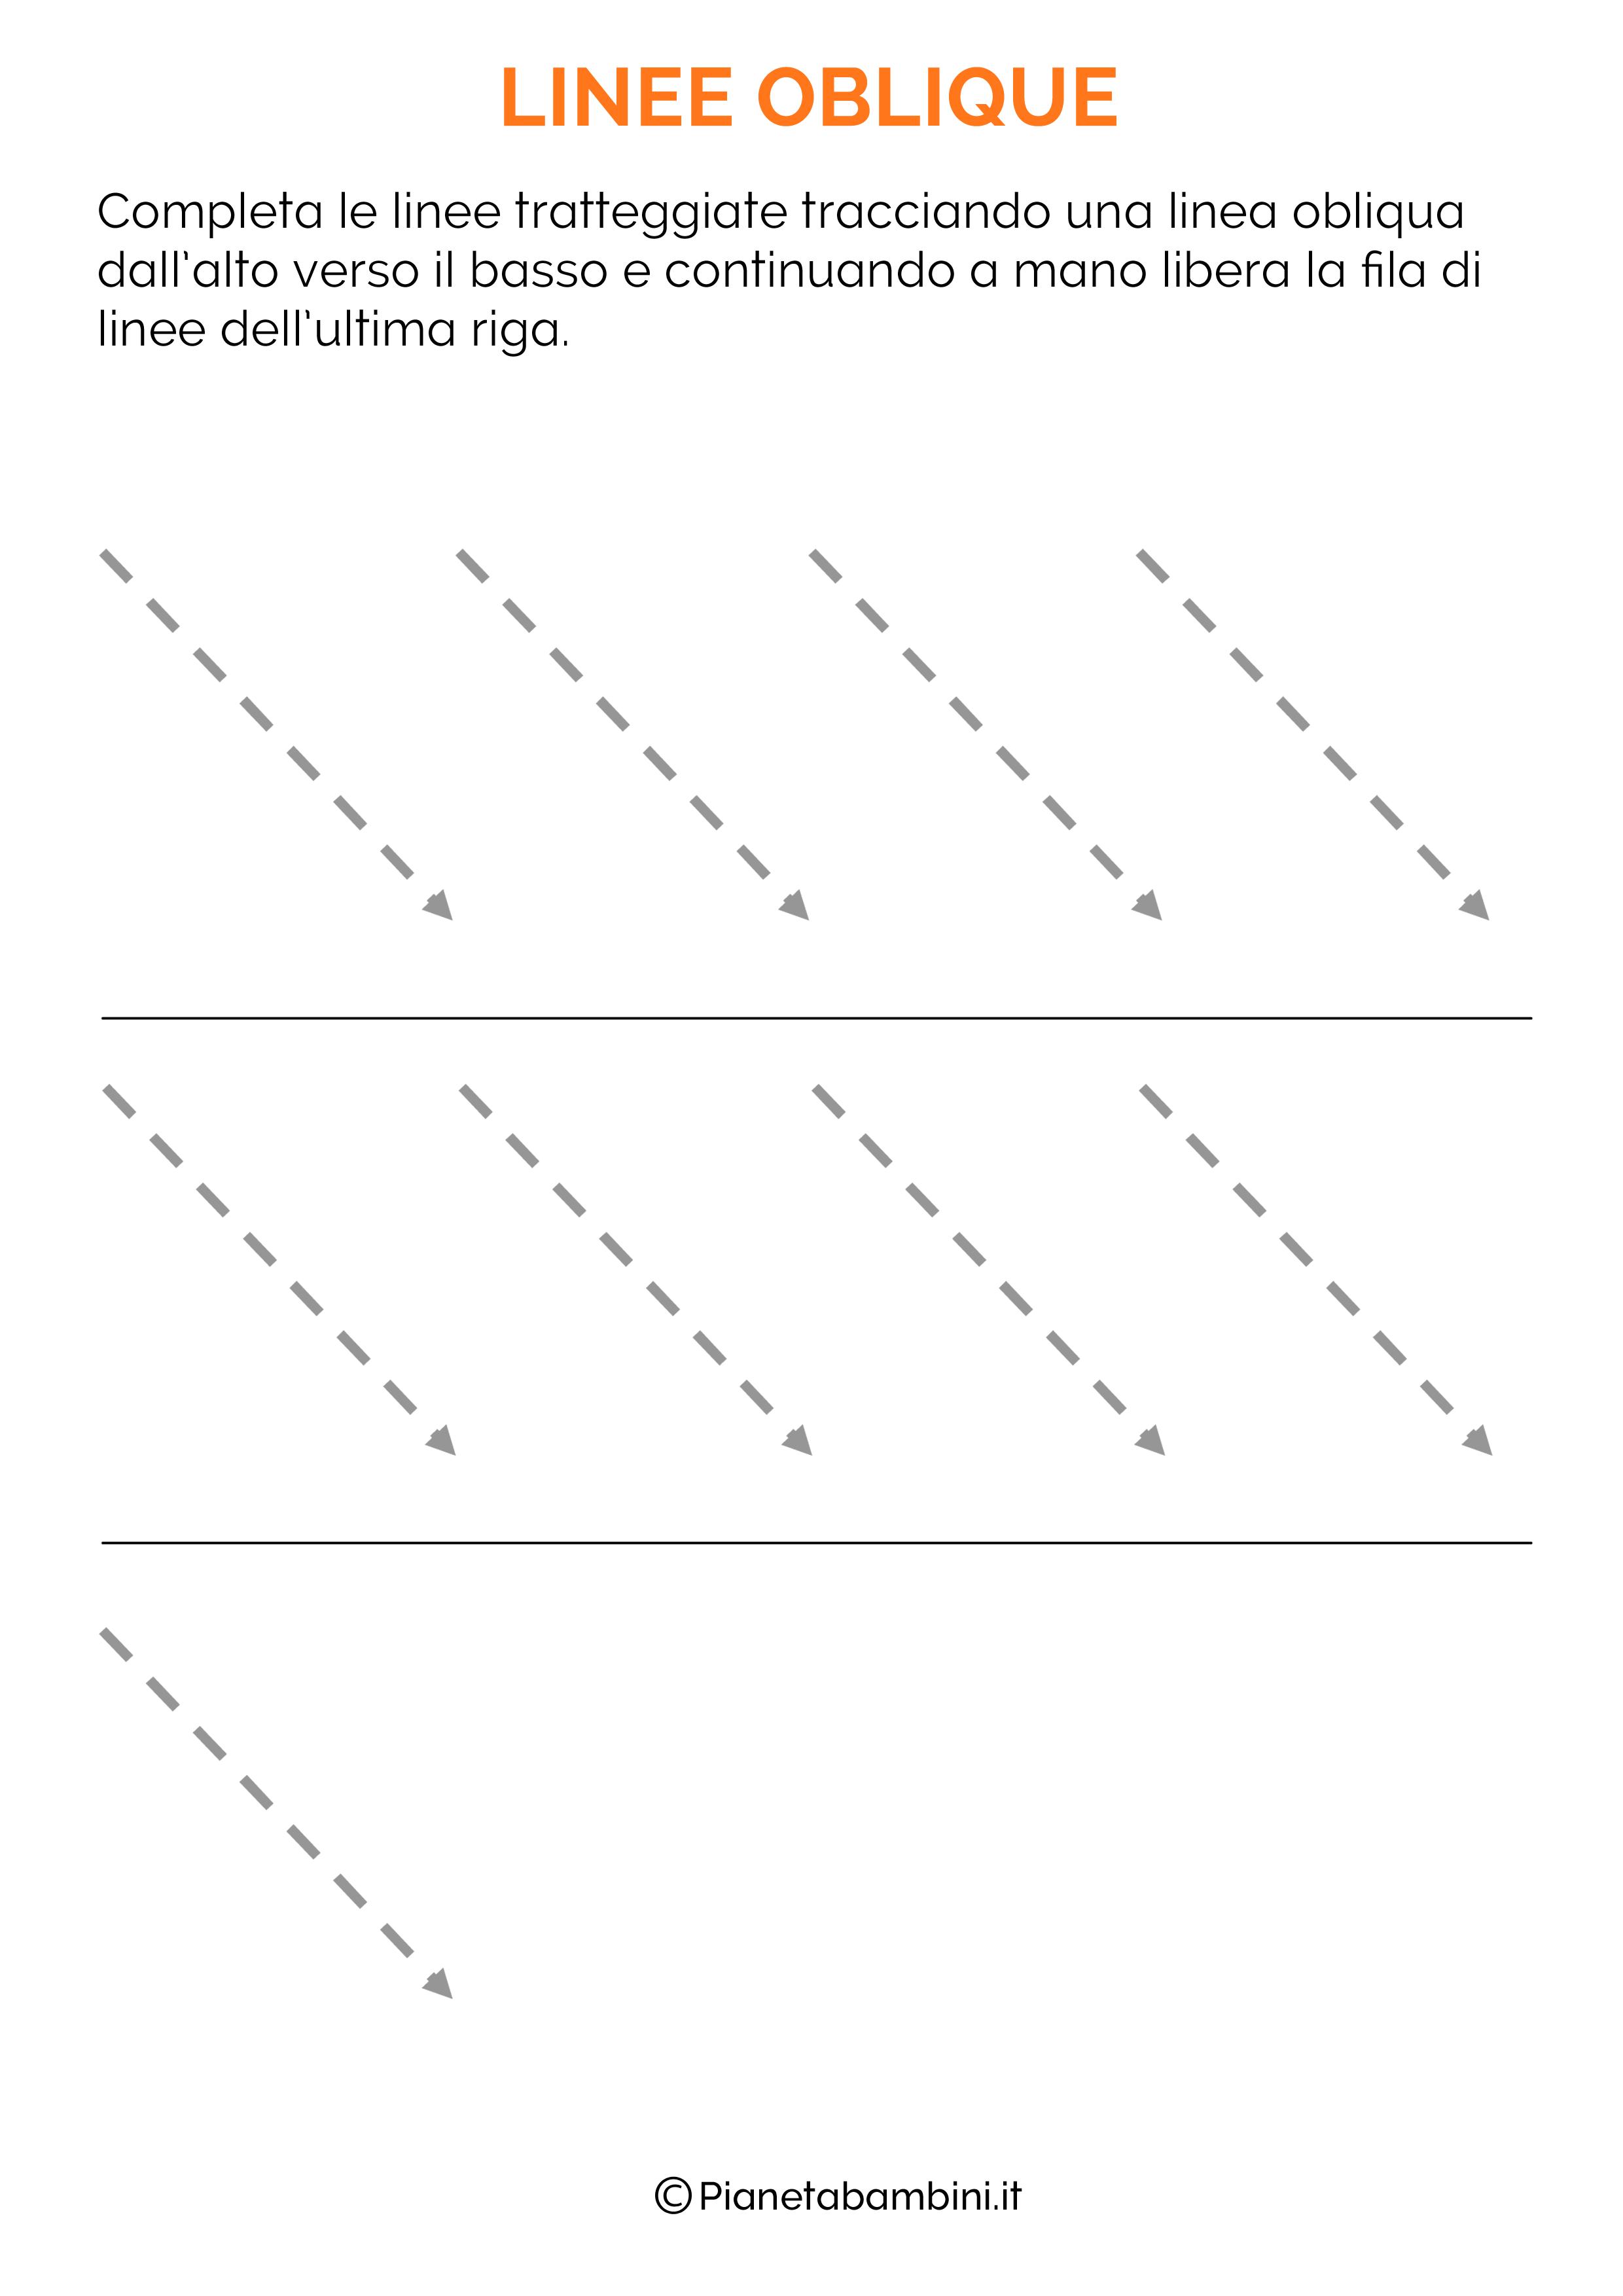 Linee-Oblique-2